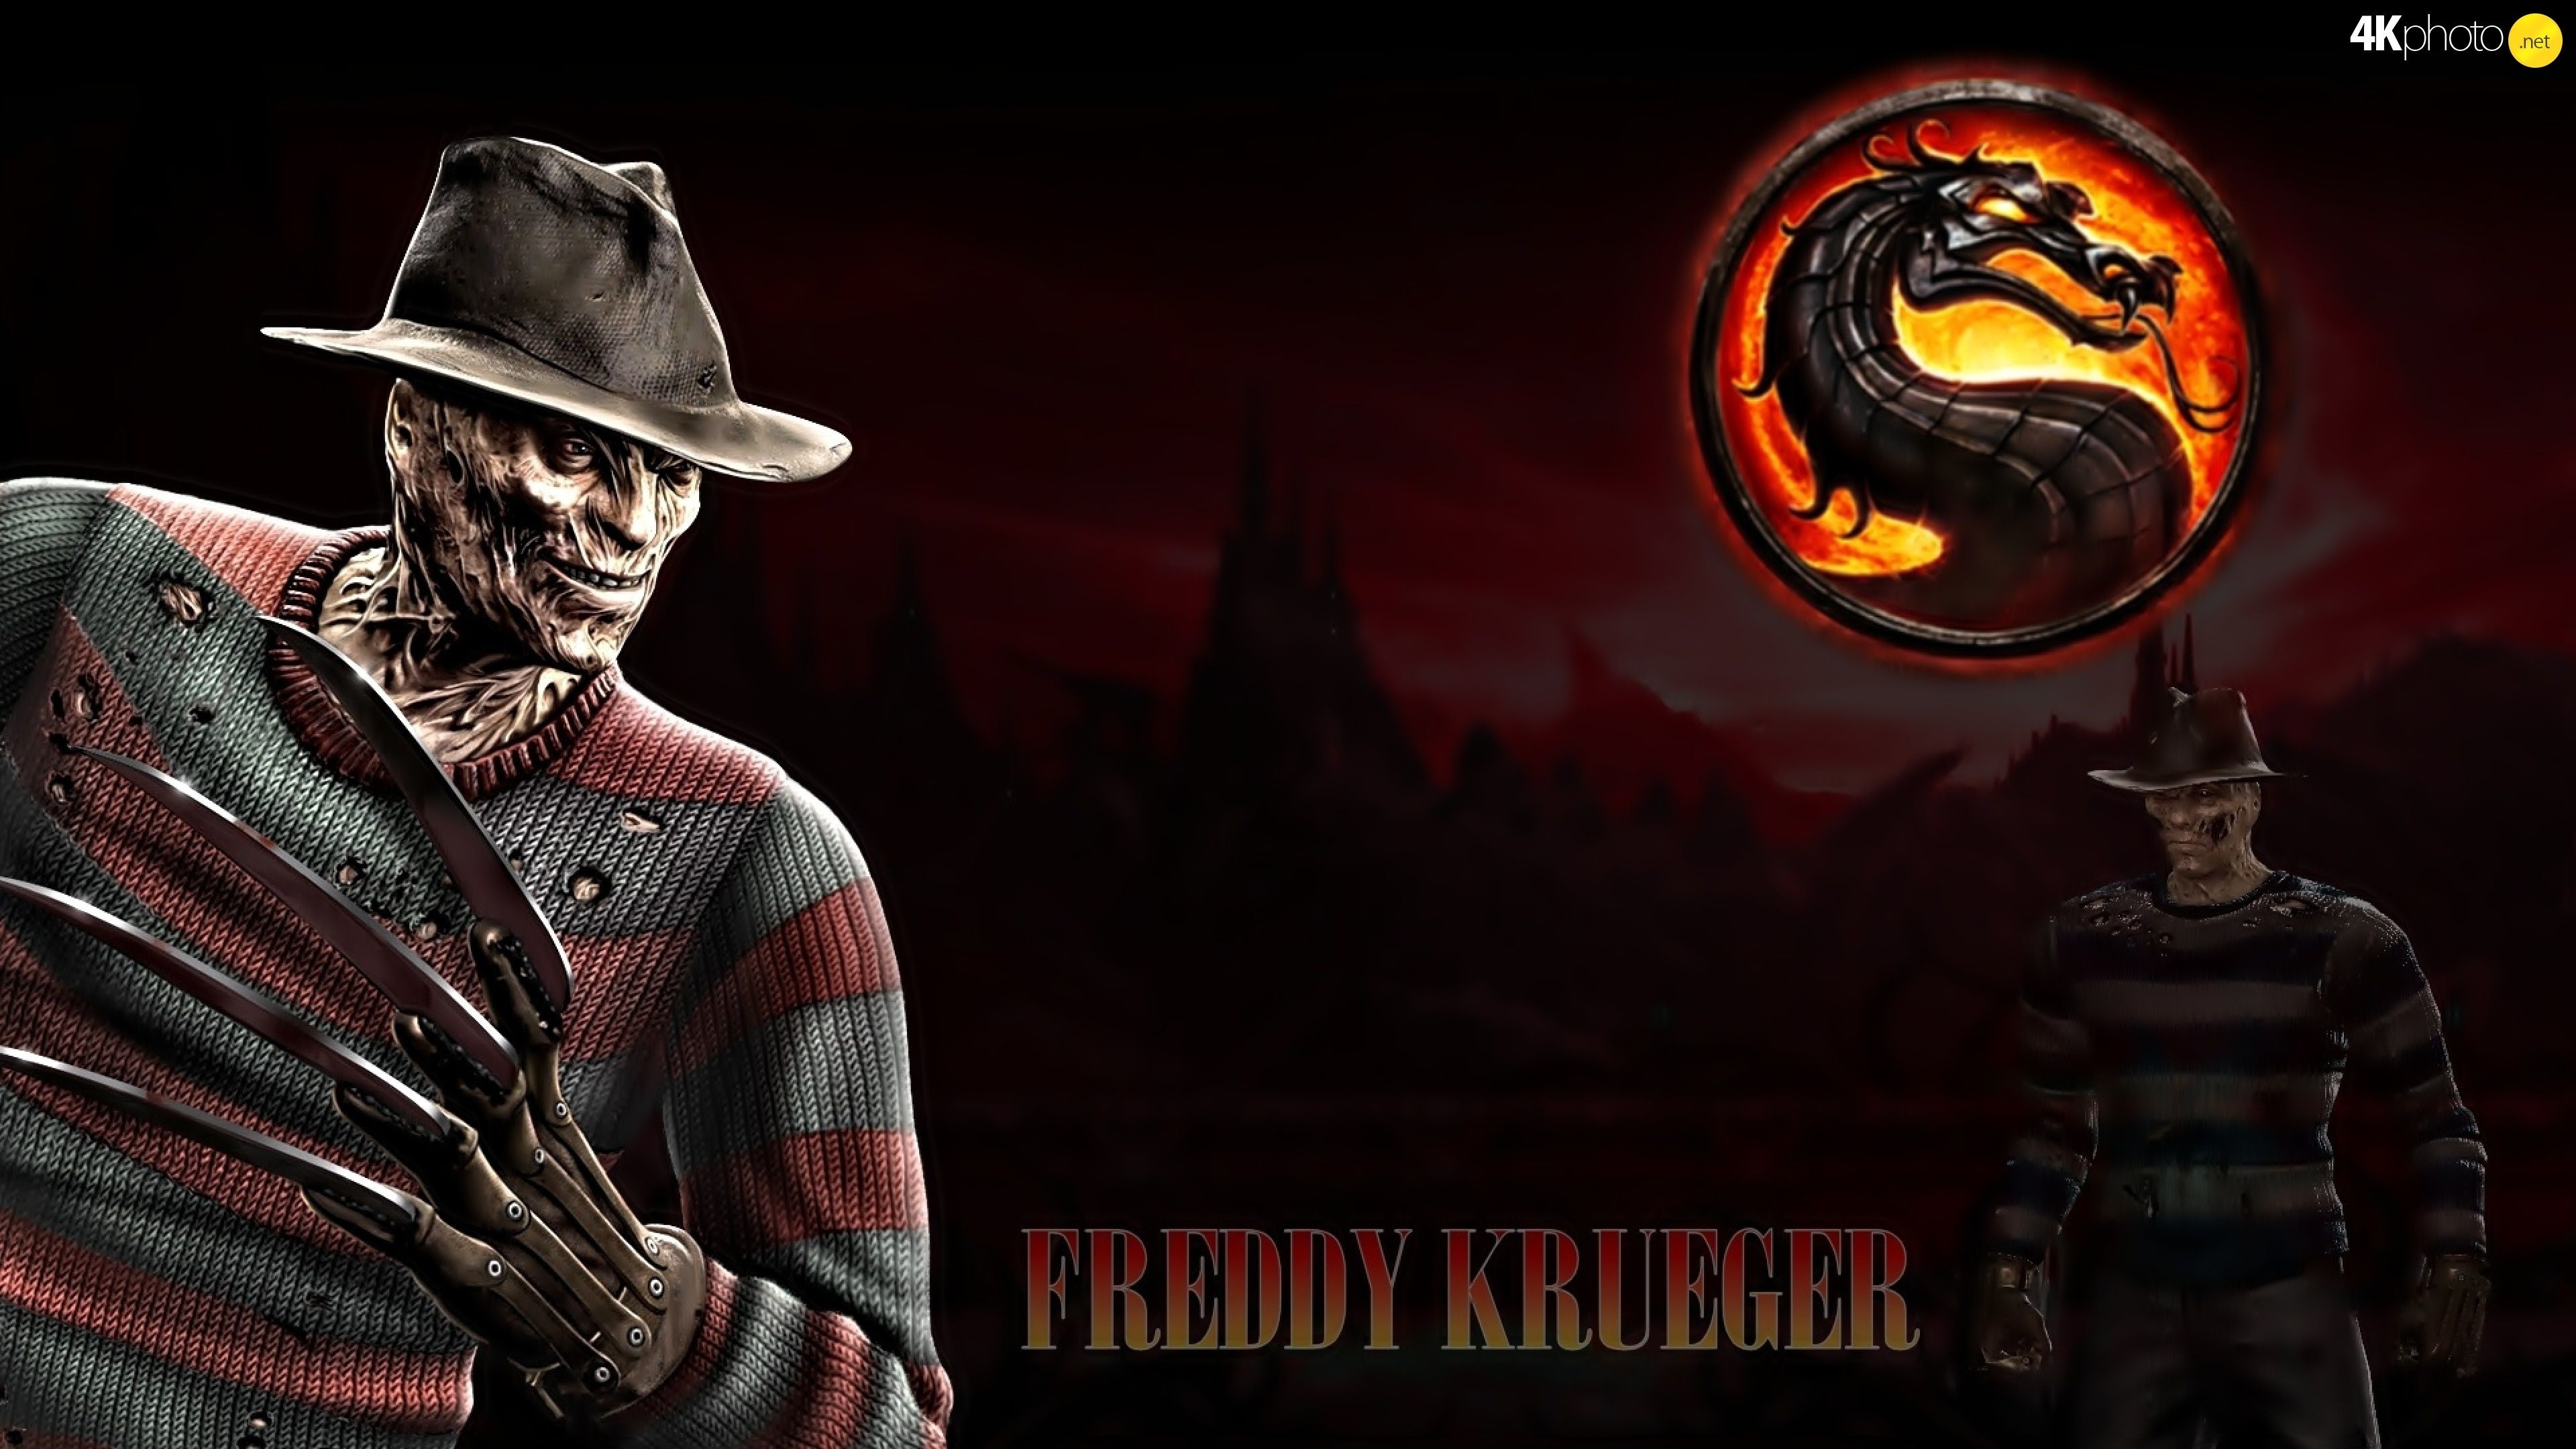 Mortal kombat freddy krueger 1600×1200 wallpapers 1600×1200 – Mortal Kombat Freddy  Krueger 1600×1200 Wallpapers 1600×1200 1600×1200